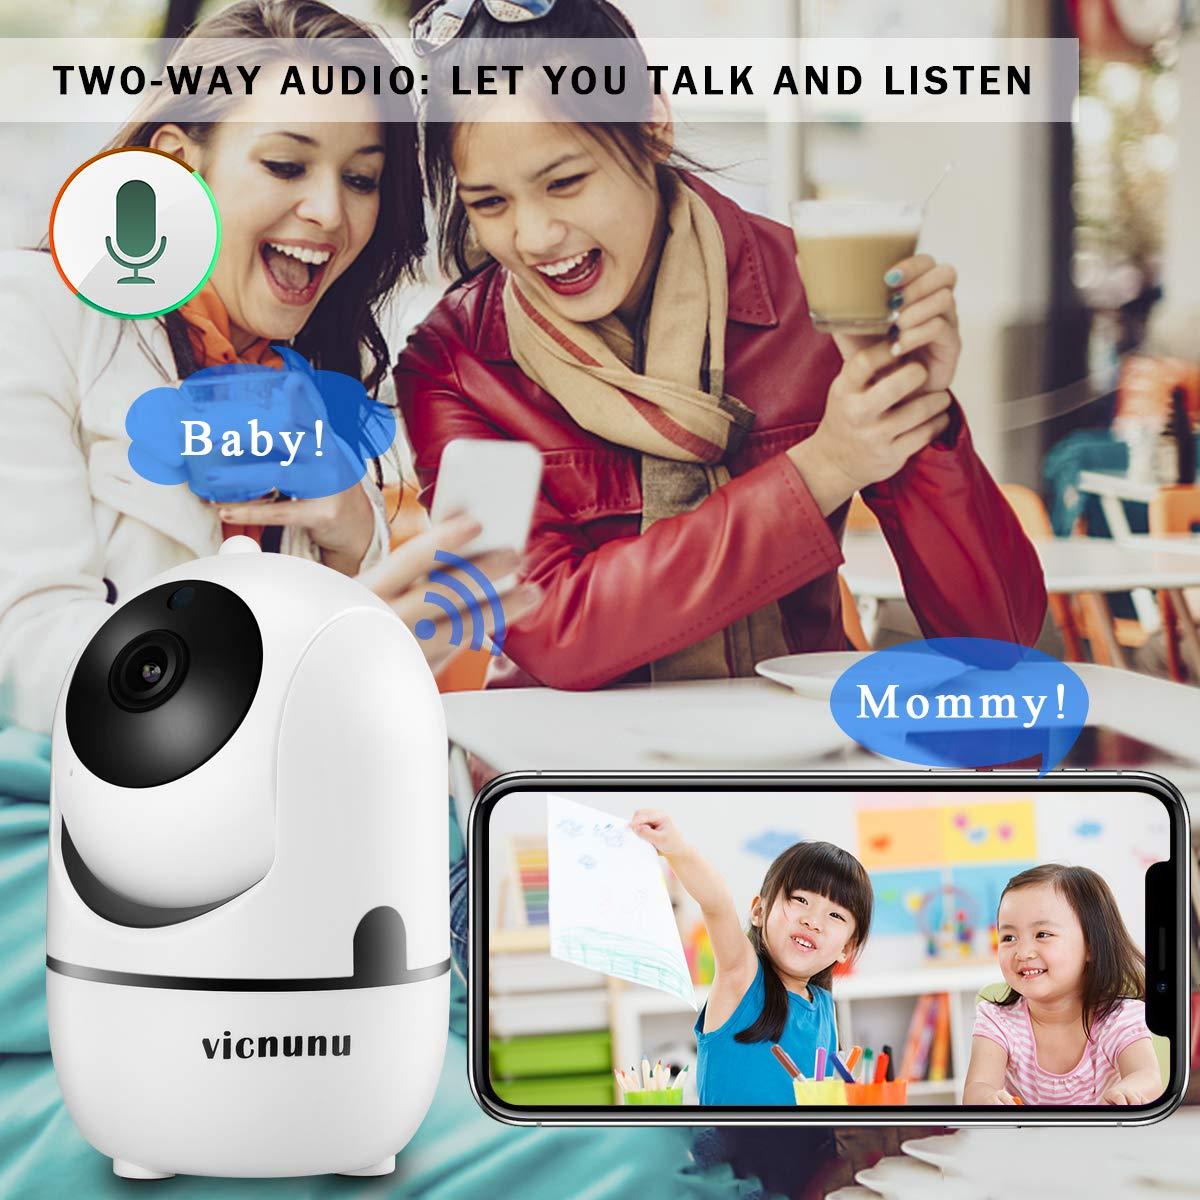 Dome Cam Pan/Tilt/Zoom Indoor Wireless IP Smart Home Camera Night Vision, Motion Tracking, Cloud Storage, 720p HD Video 2-Way Audio Vicnunu